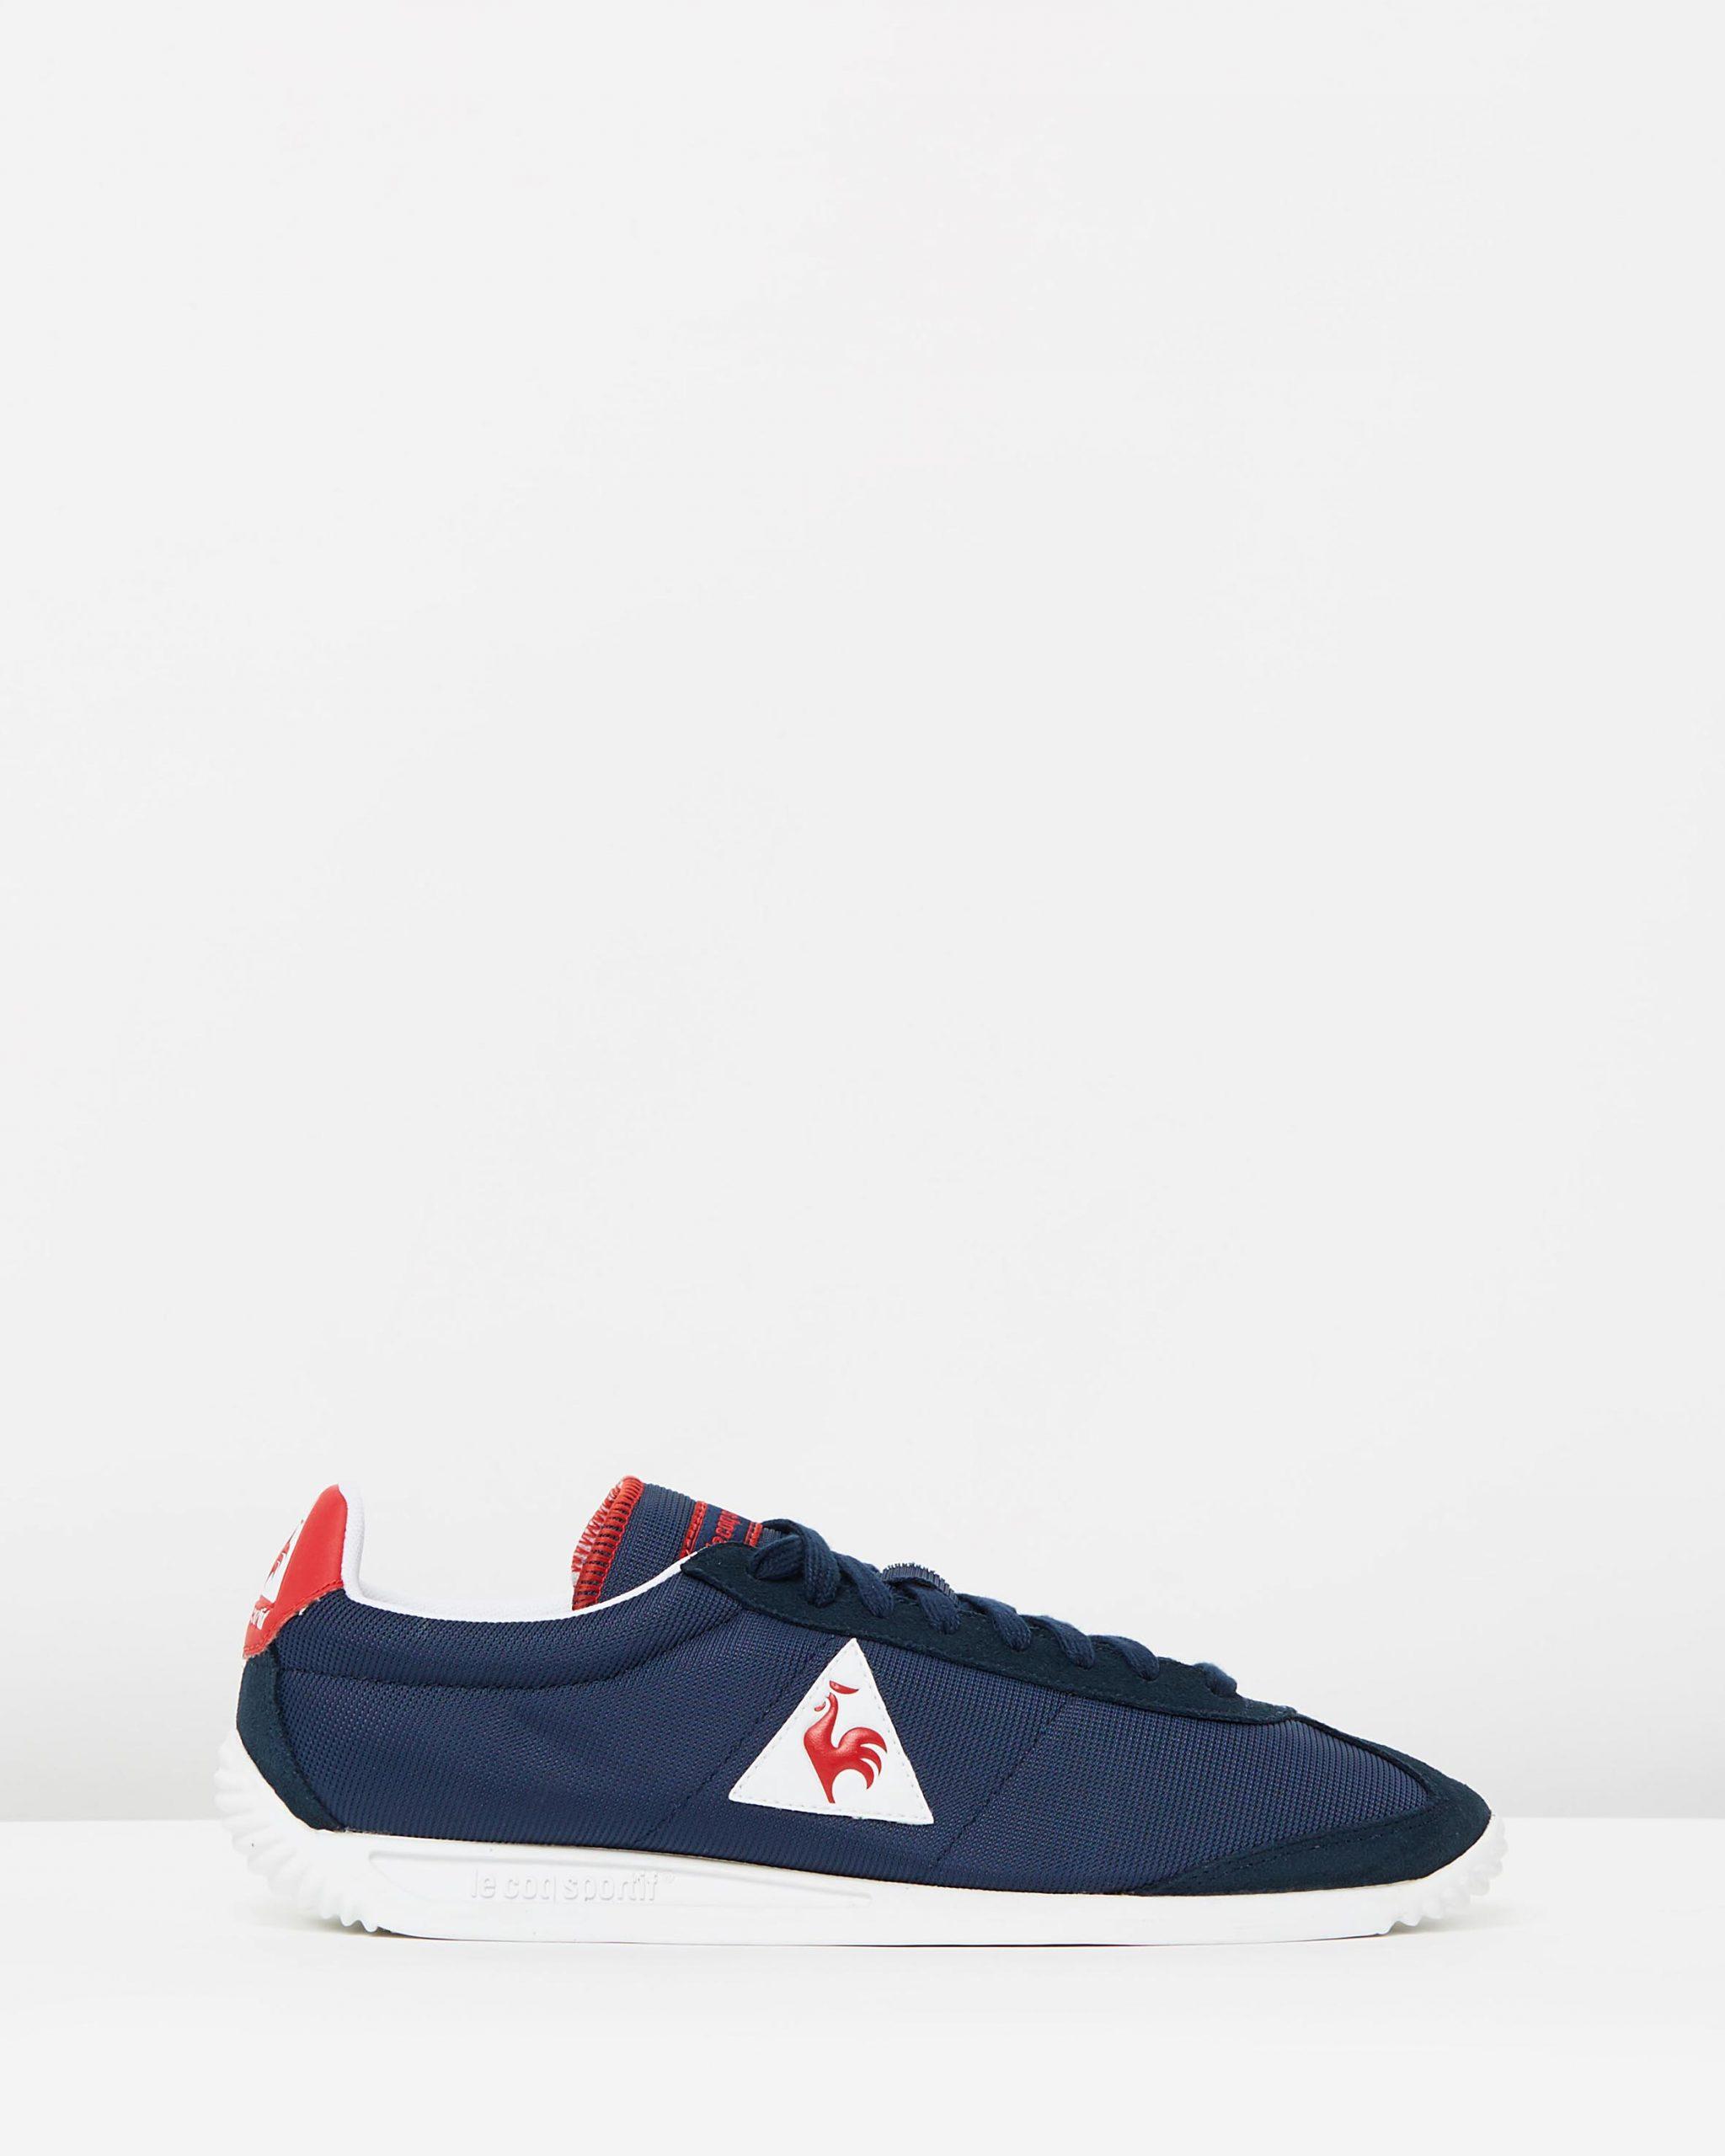 Le Coq Sportif Quartz Nylon Sneakers In Dress Blue